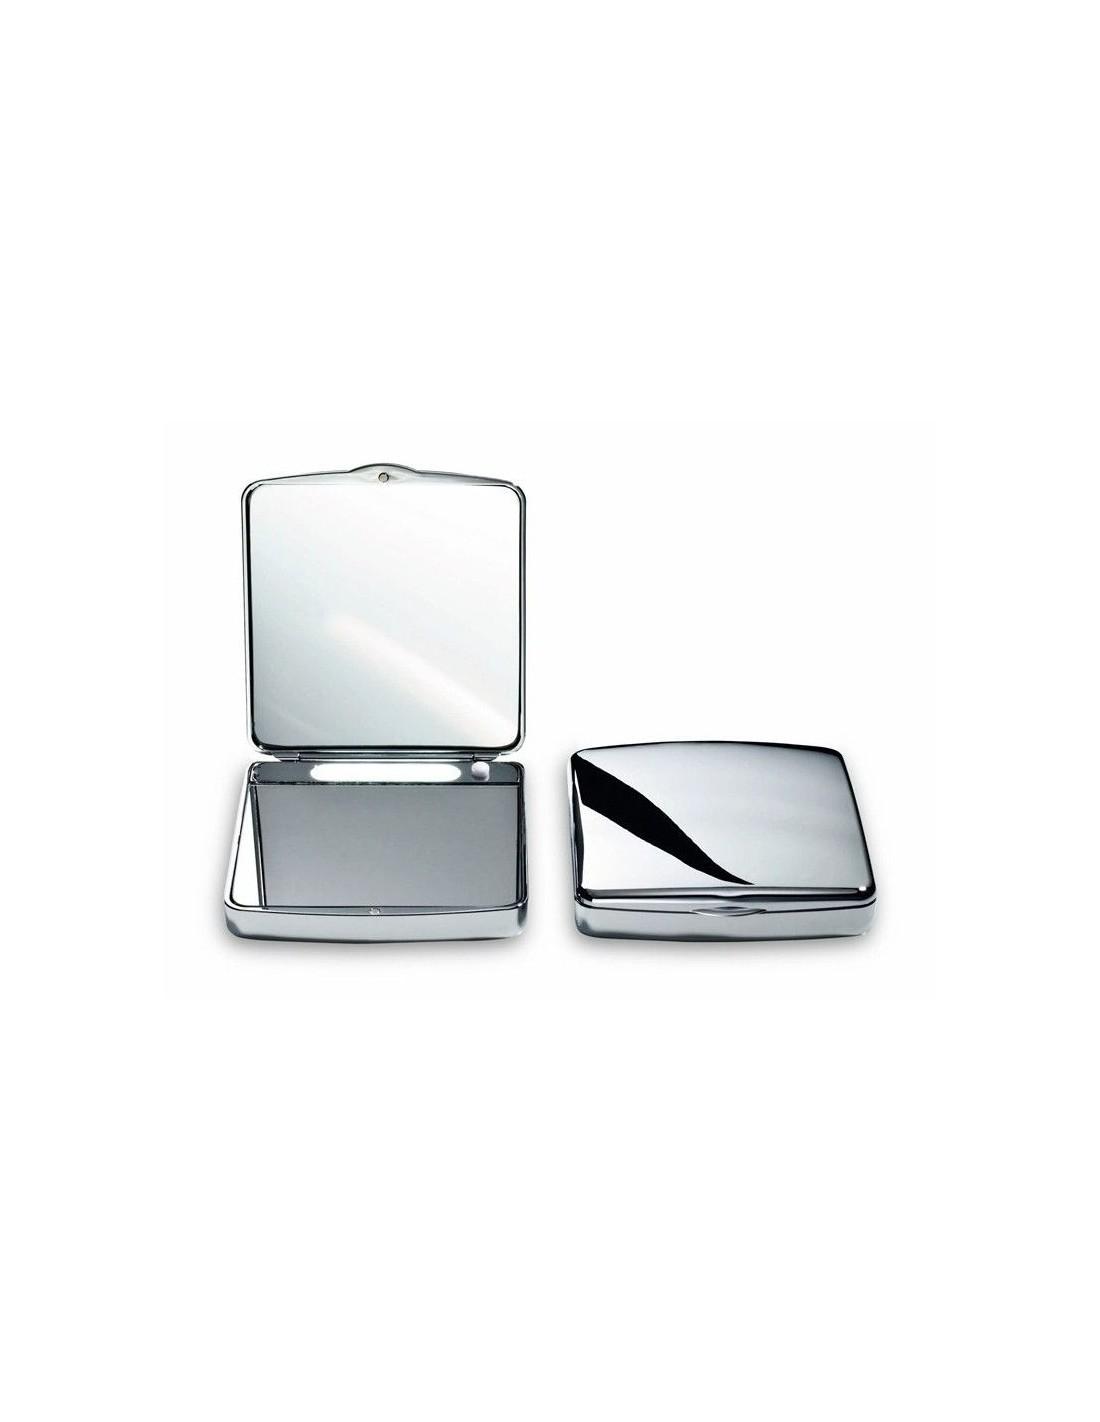 miroir de poche grossissant clairant decor walther. Black Bedroom Furniture Sets. Home Design Ideas